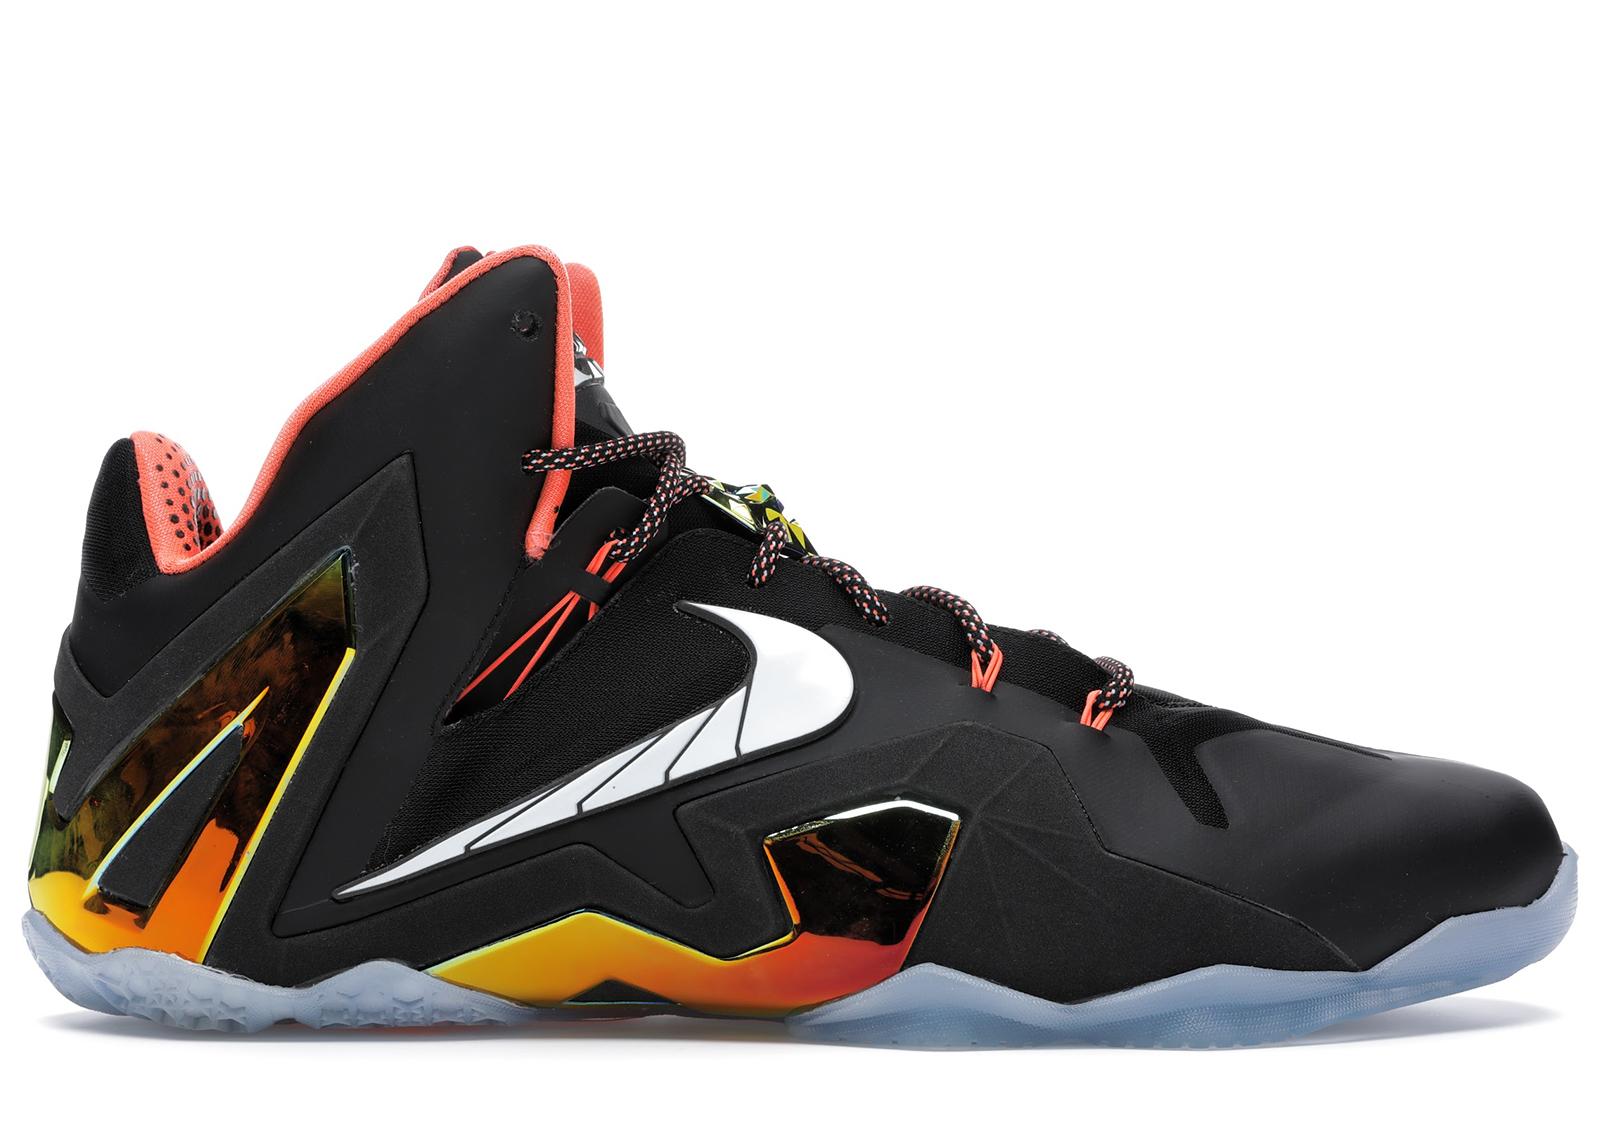 Nike LeBron 11 Elite Black Gold